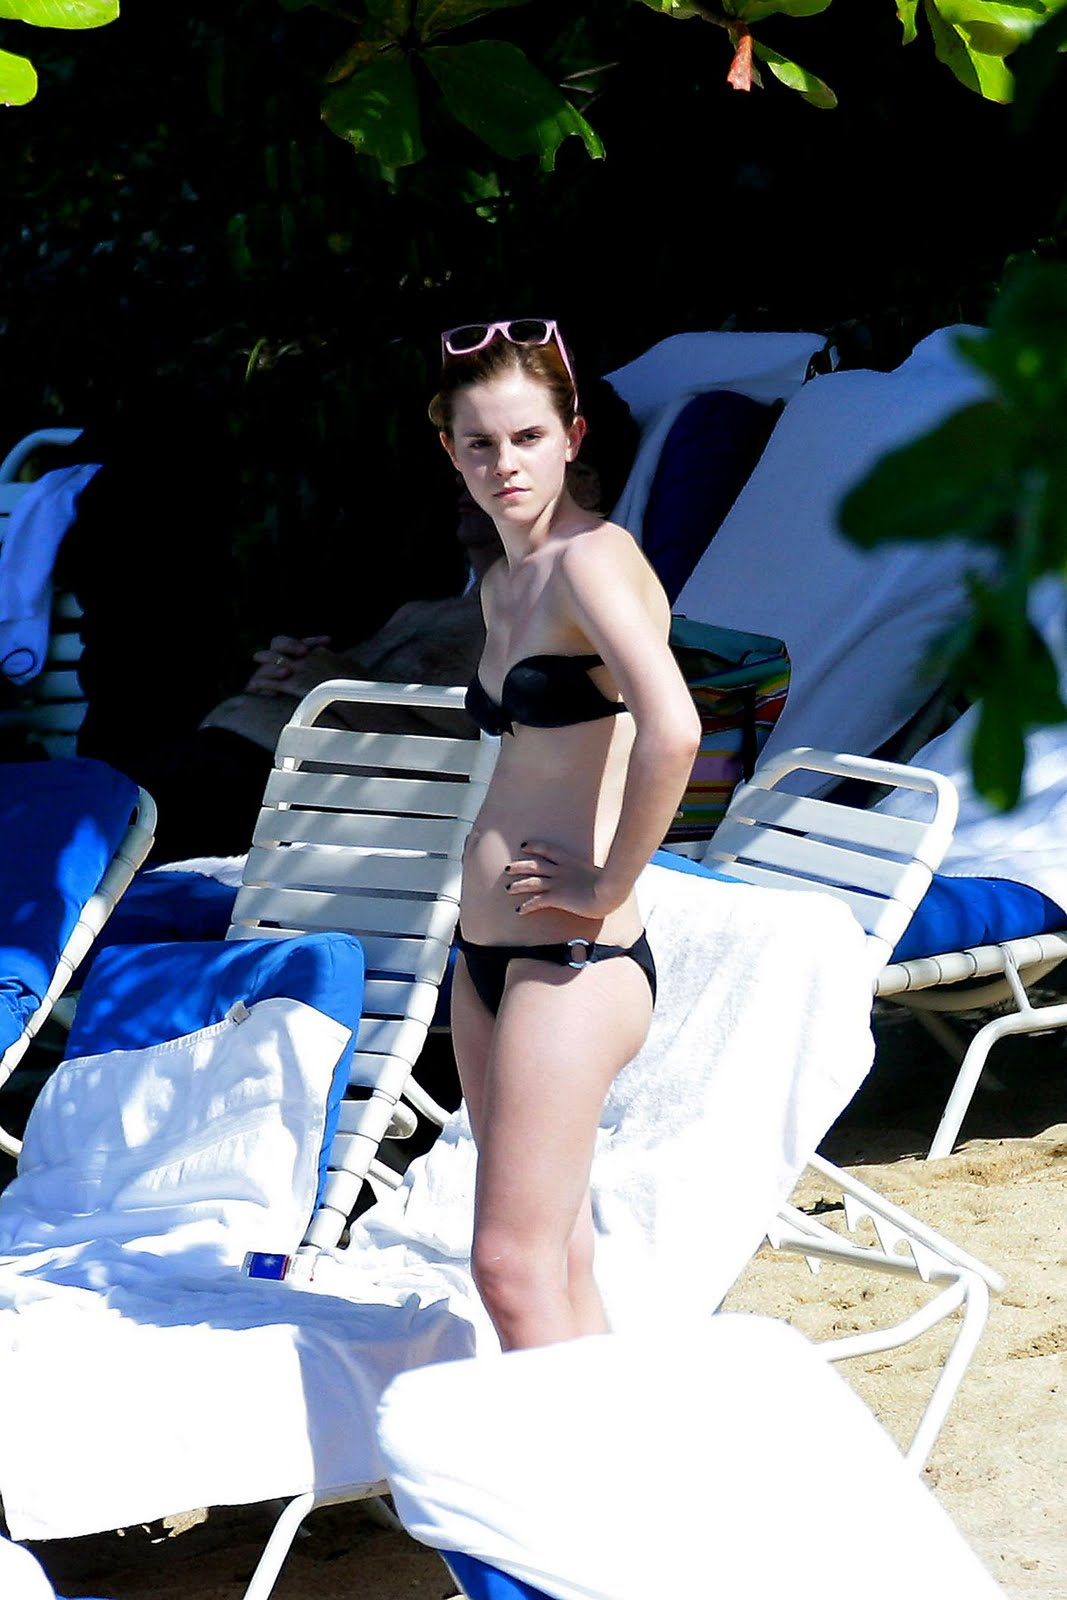 http://1.bp.blogspot.com/-1tKrsR9YIZI/TcP3A-werNI/AAAAAAAAAwk/FWk7PHXcpOE/s1600/emma_watson_bikini3.jpg